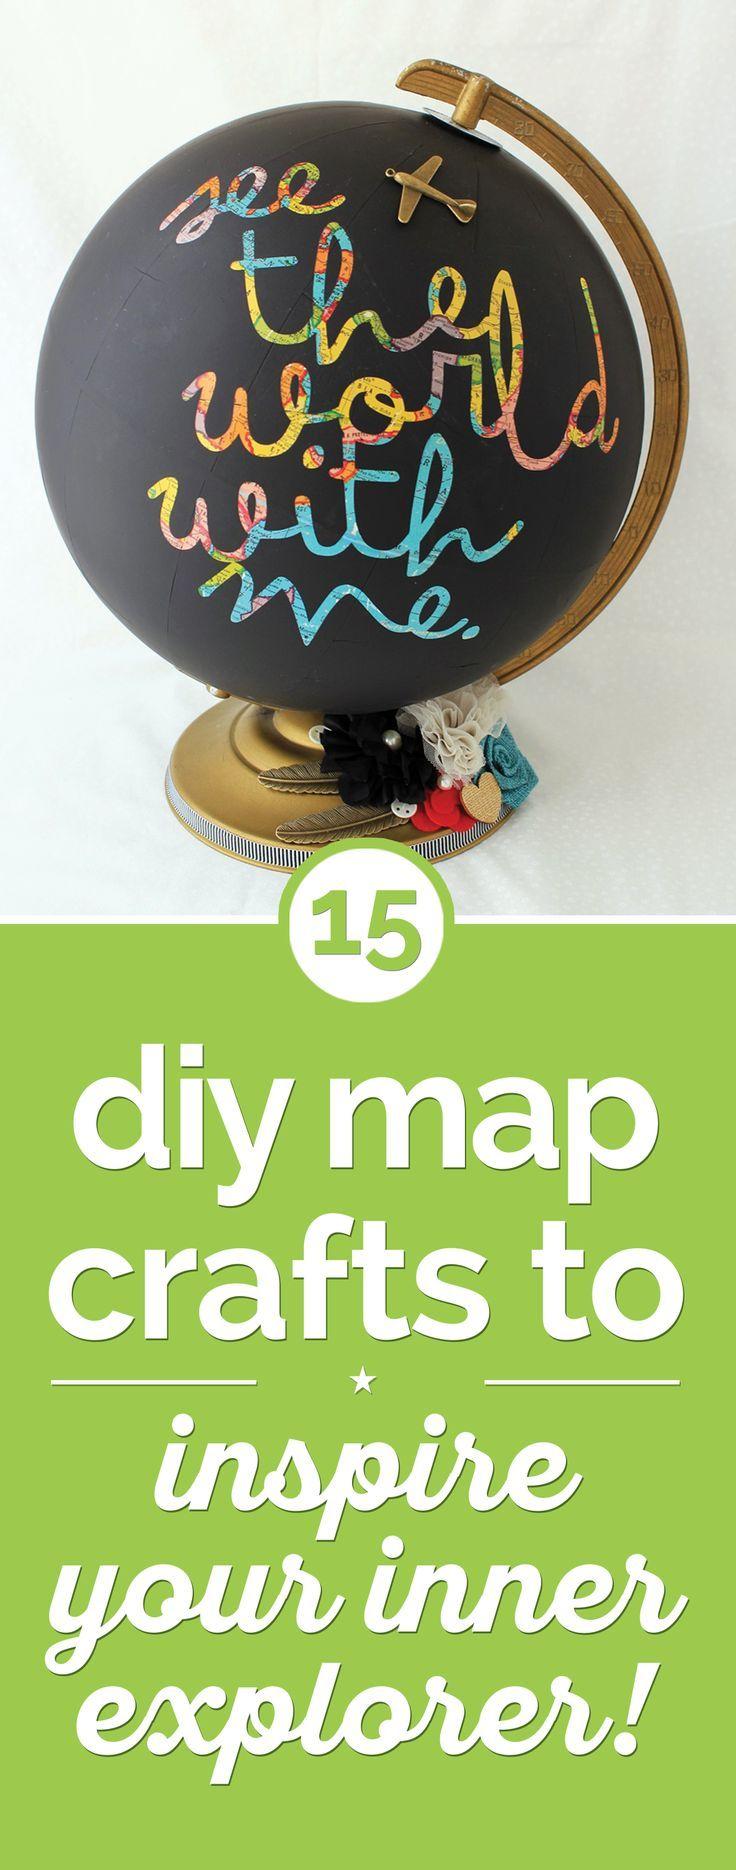 15 DIY Map Crafts to Inspire Your Inner Explorer!